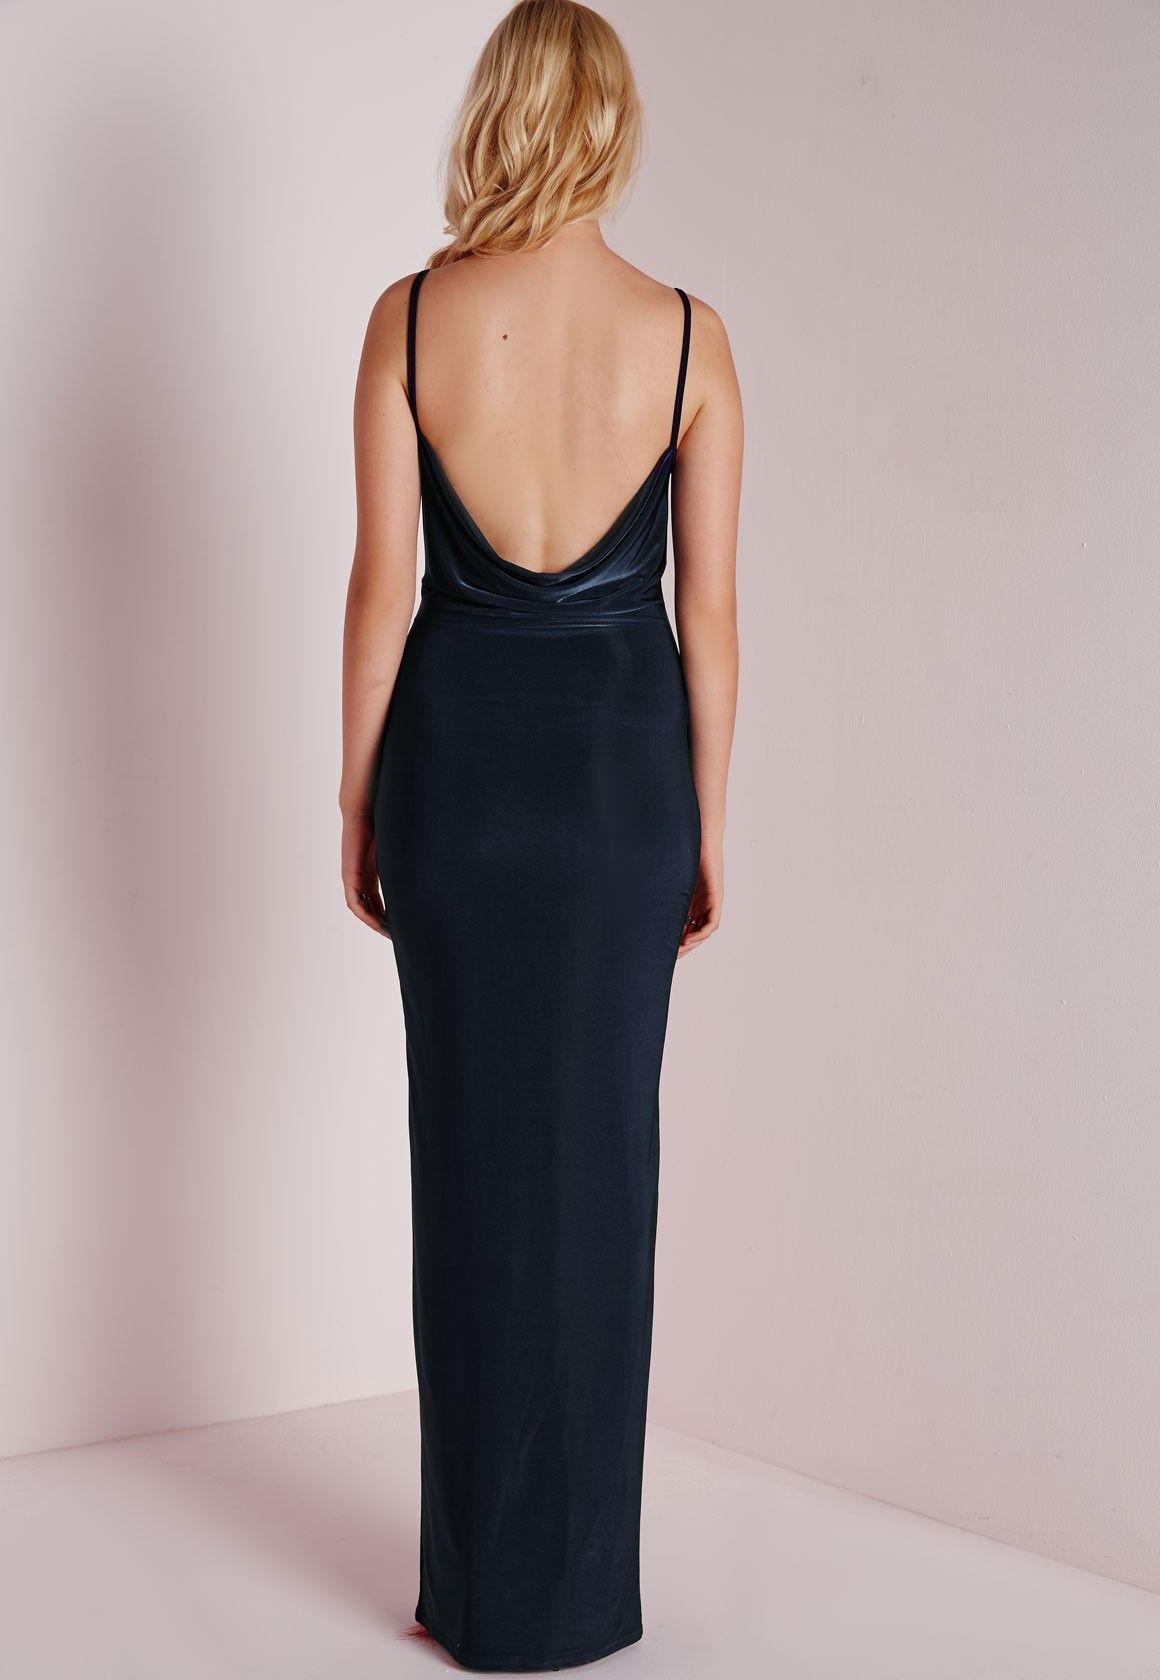 Slinky Cowl Maxi Dress Navy - Dresses